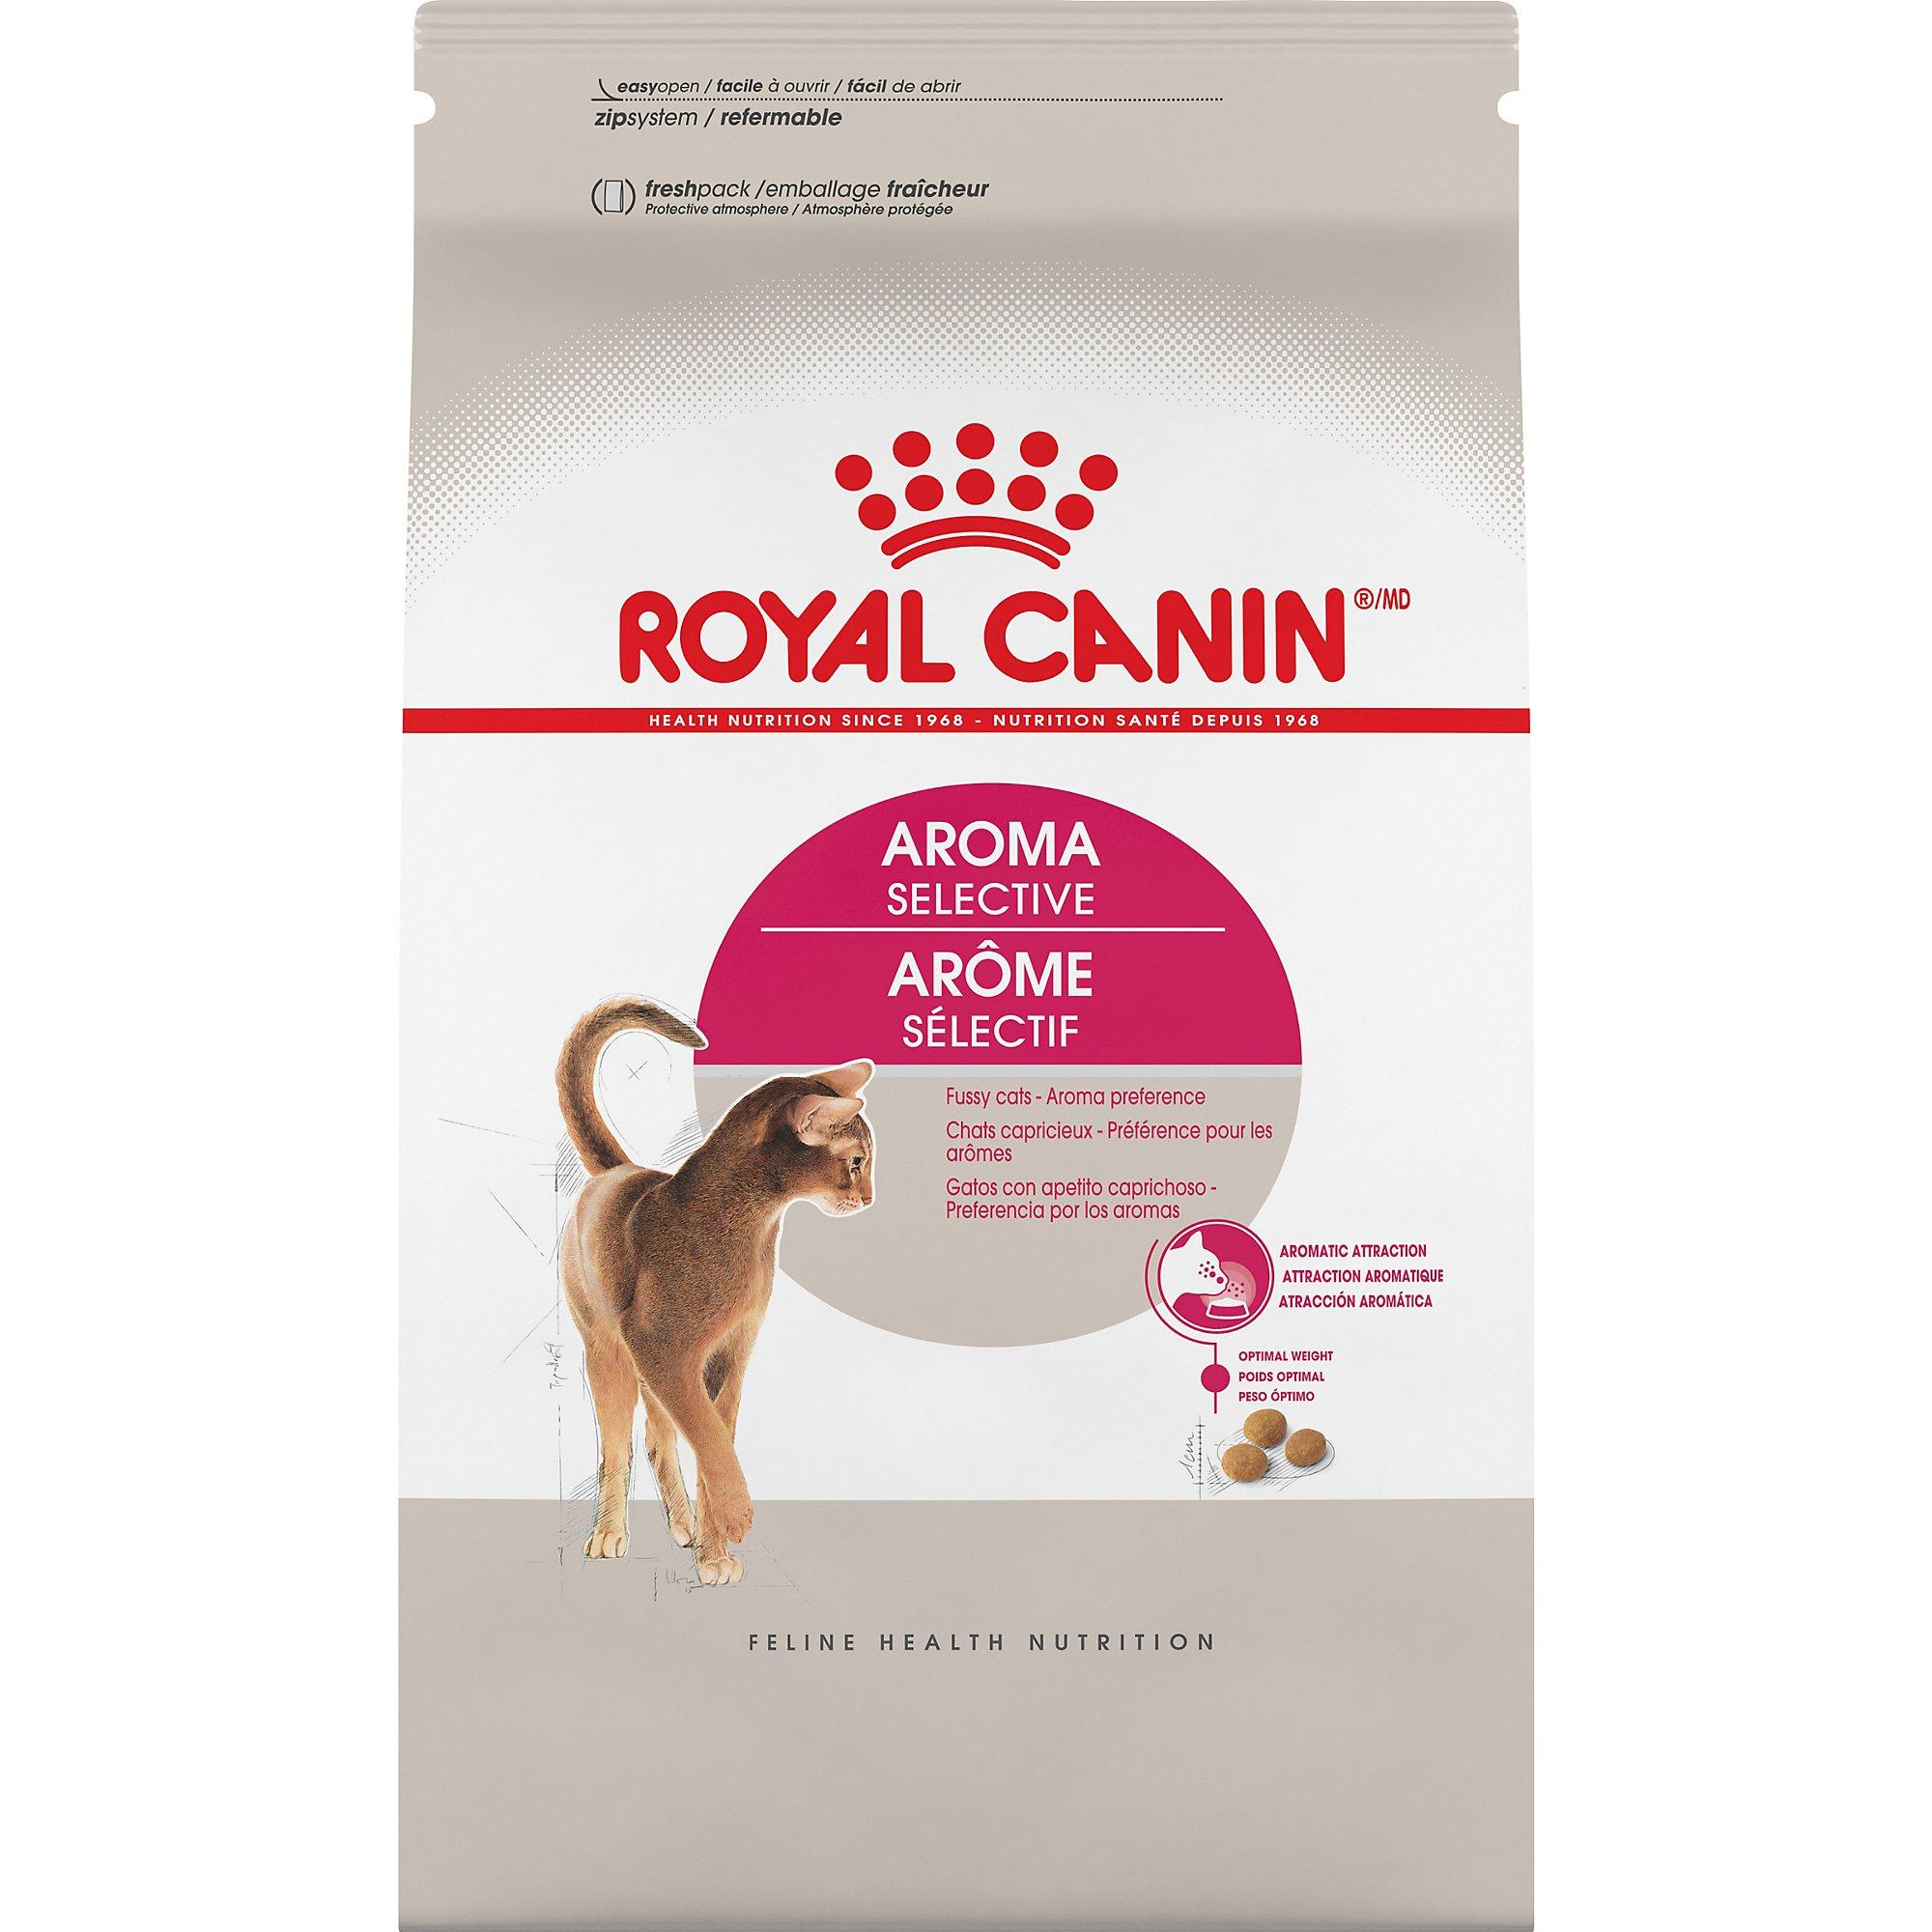 Royal Canin FELINE HEALTH NUTRITION Aromatic Selective dry cat food